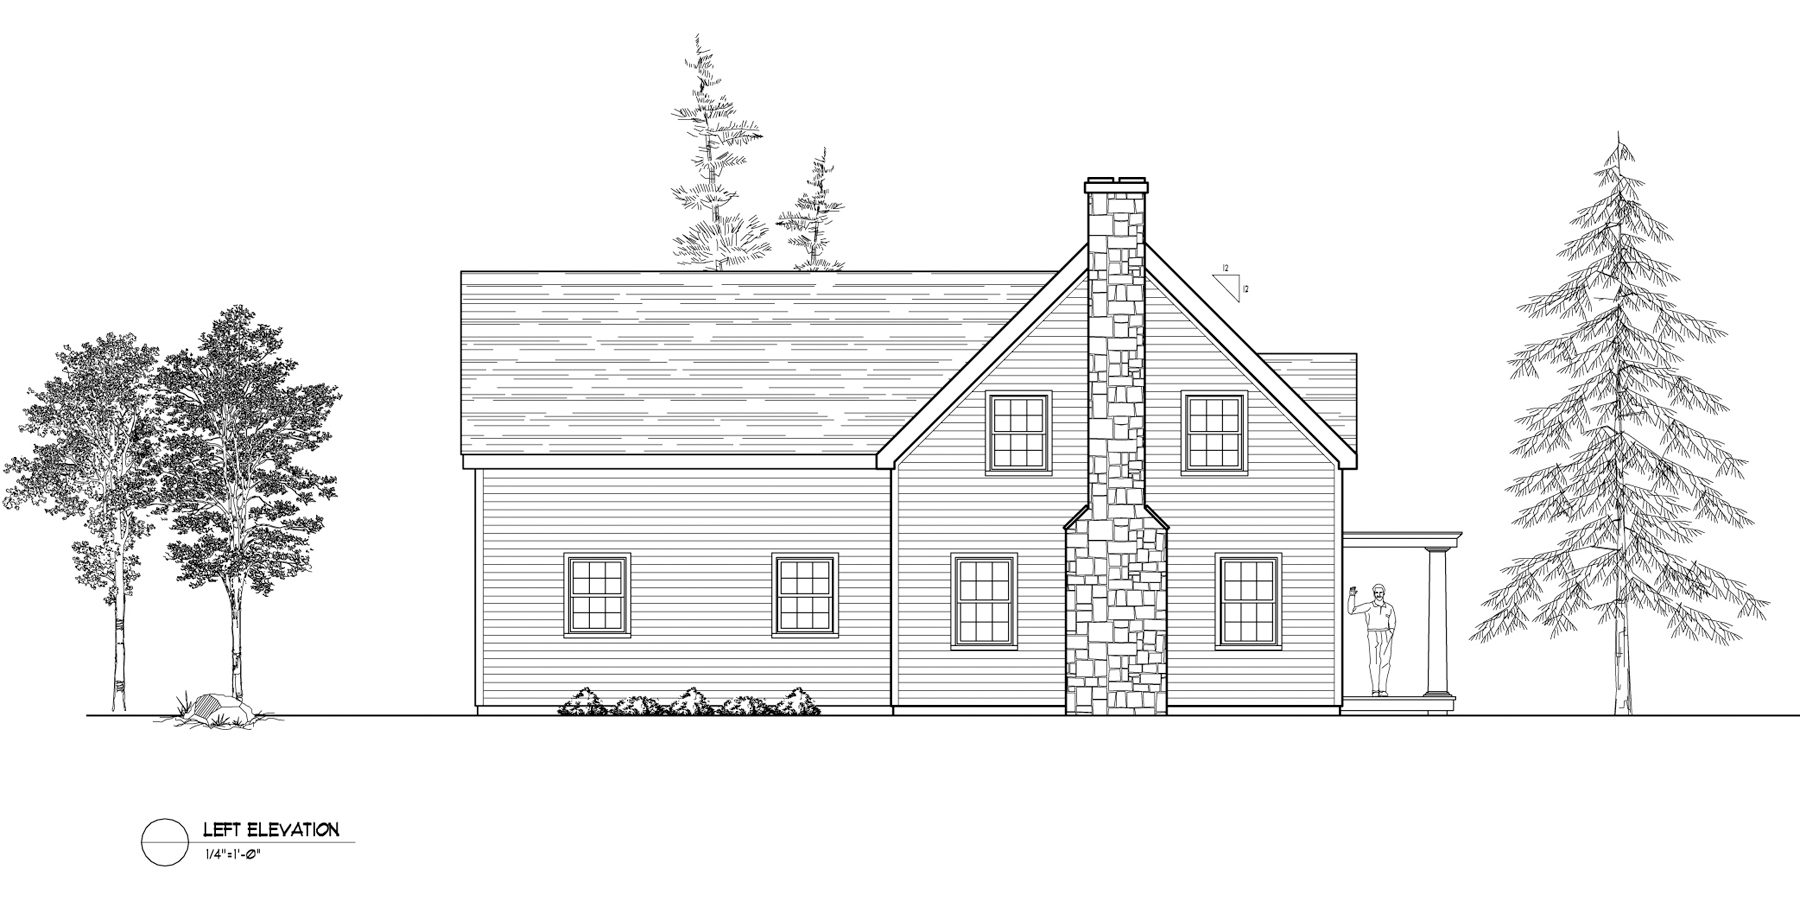 Normerica Timber Frames, House Plan, The Niagara 3539, Left Elevation